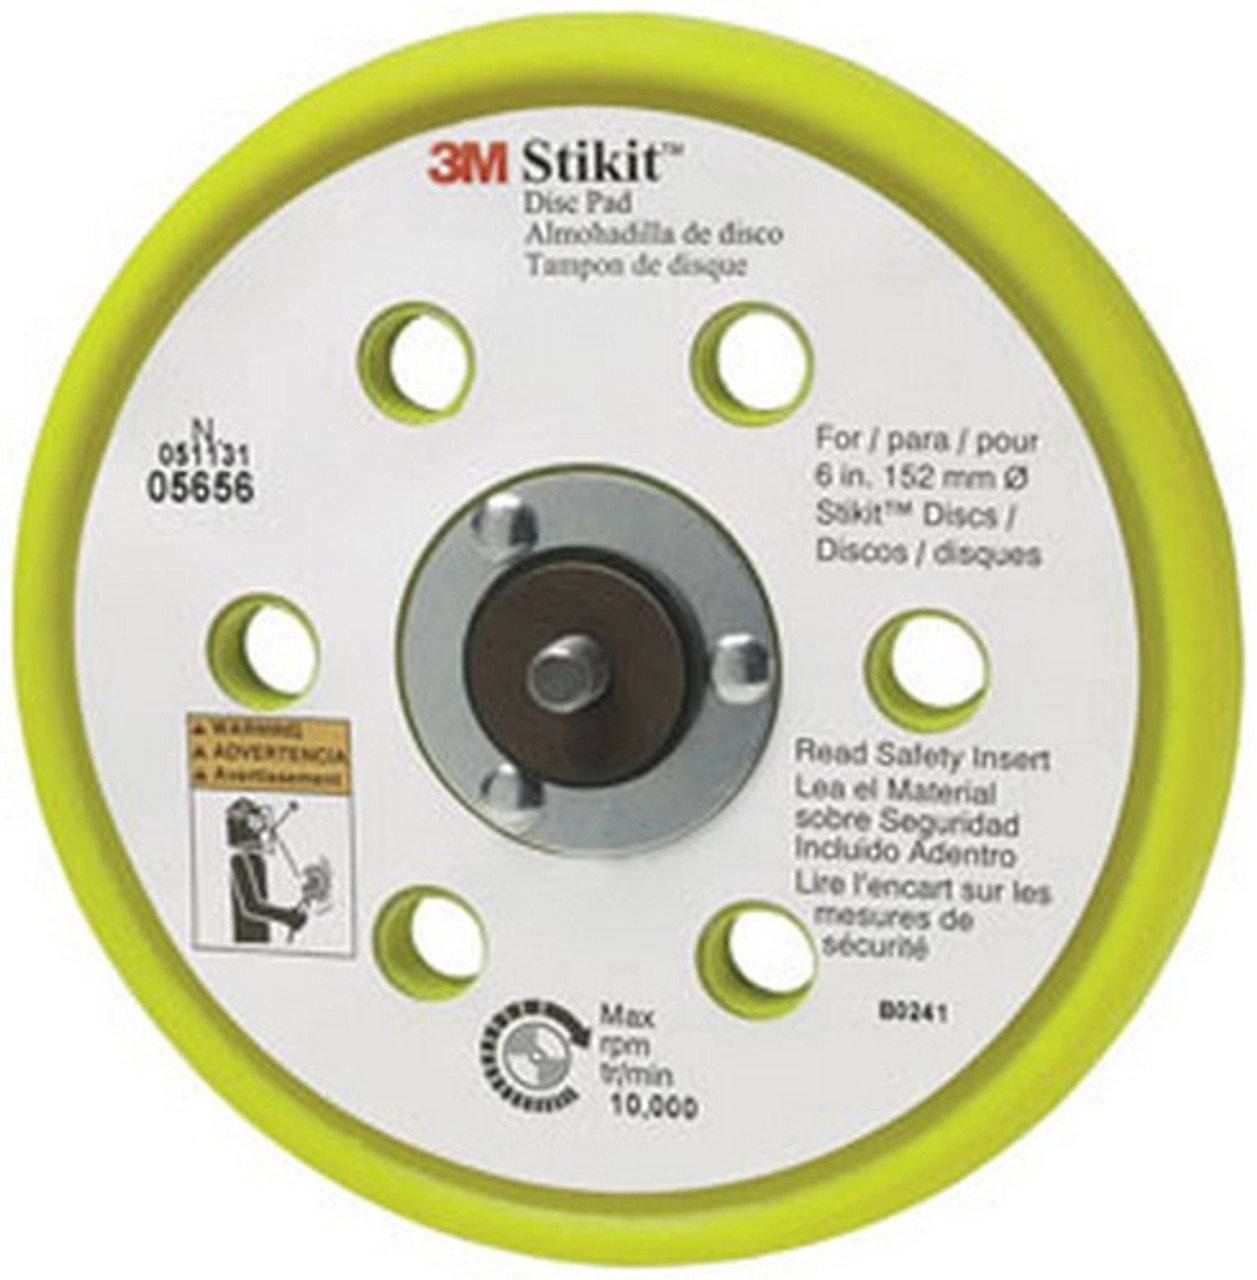 3M 05756 Hookit 6 Low Profile Disc Pad